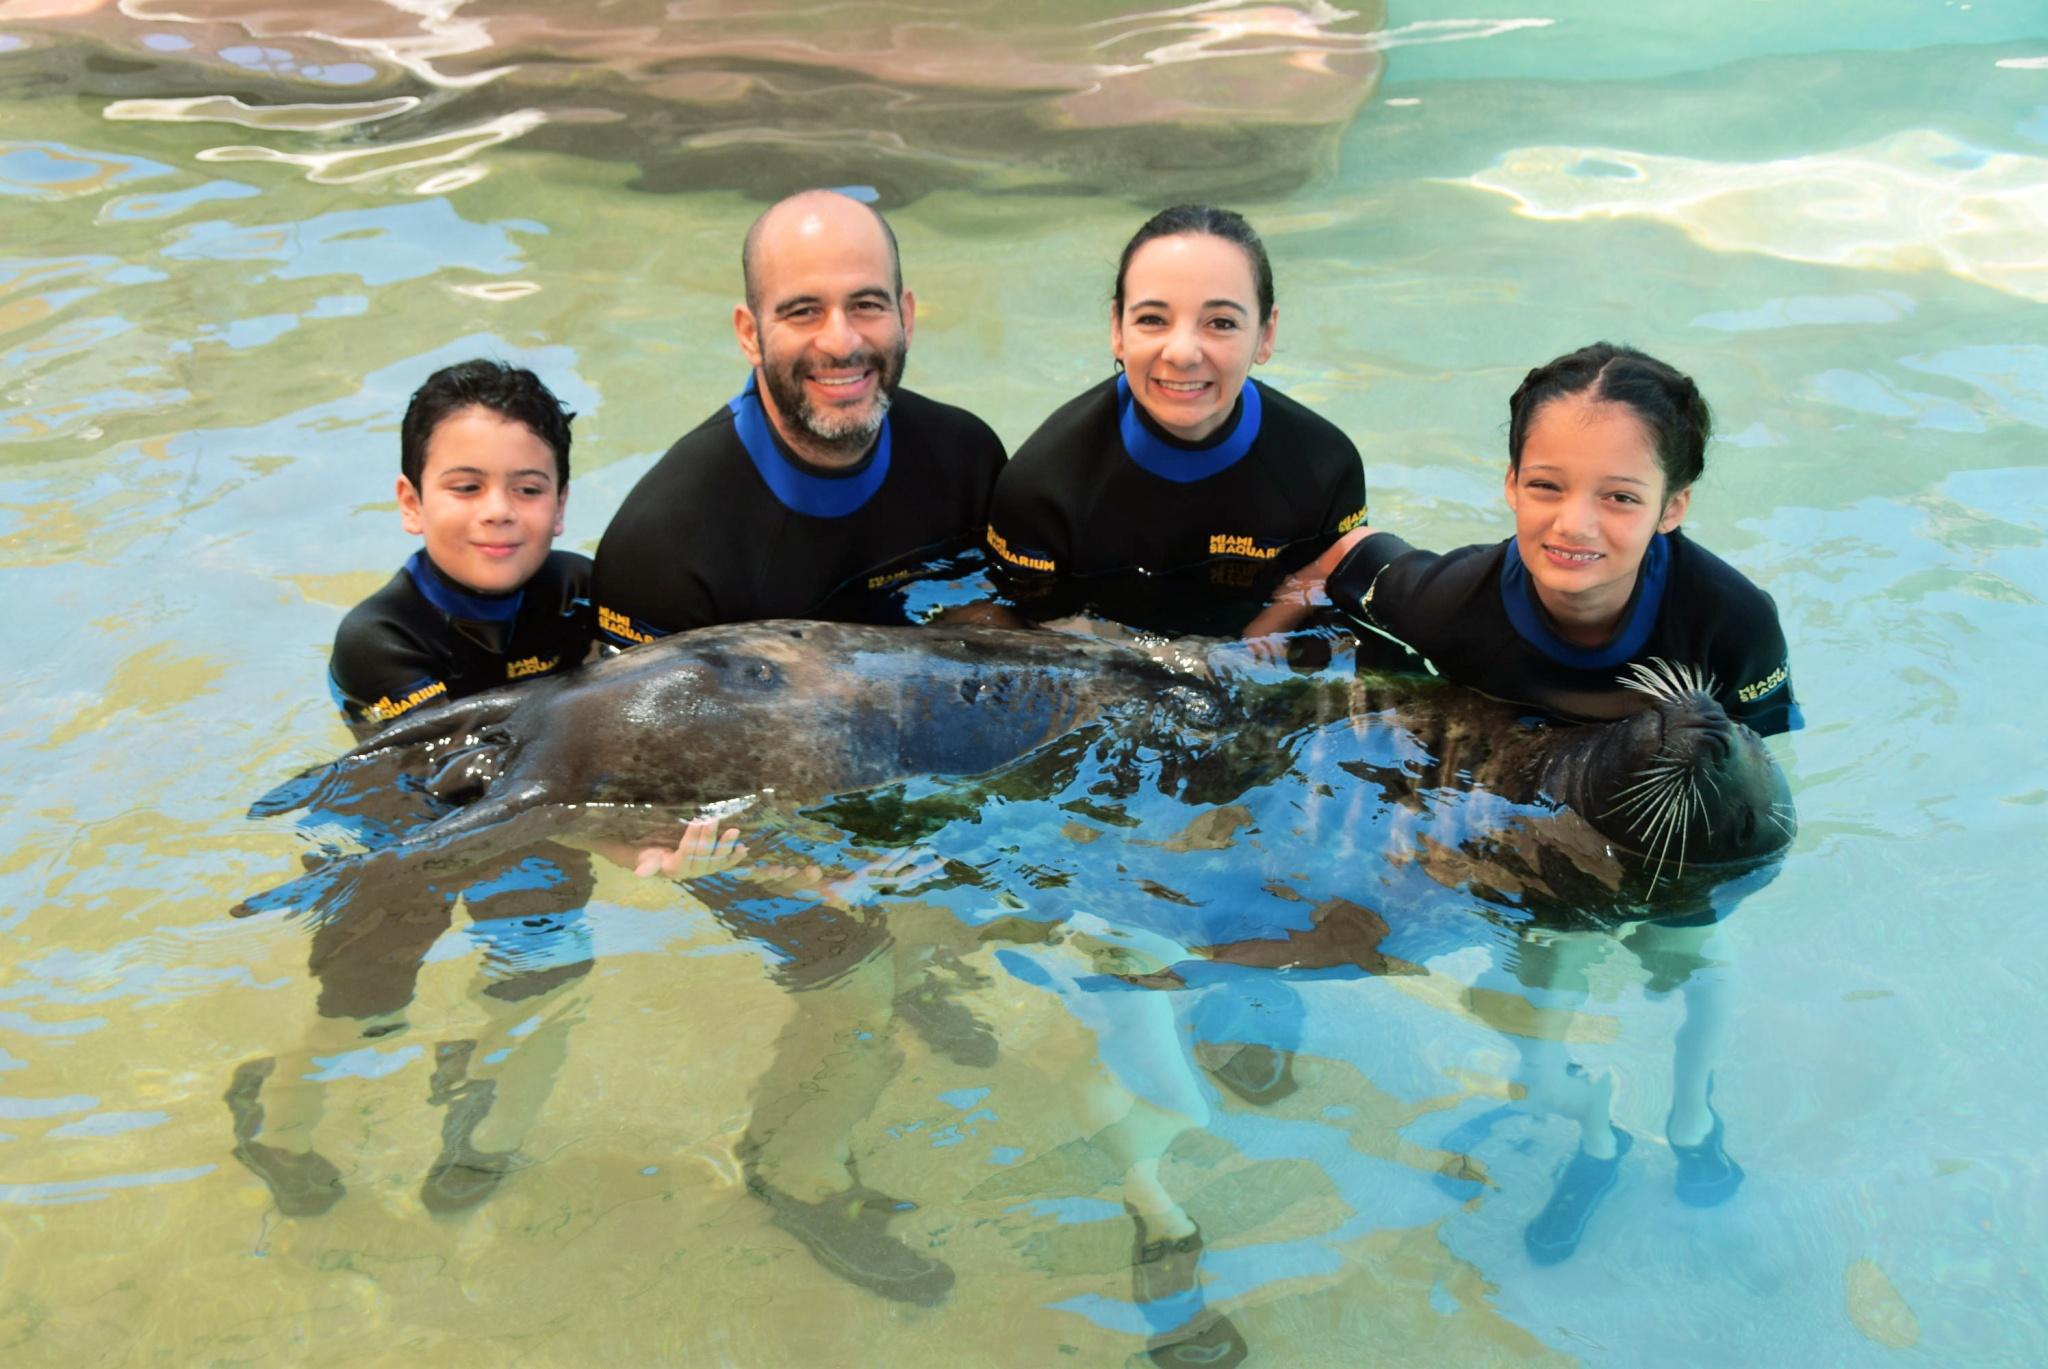 swimming with seals at the Miami Seaquarium